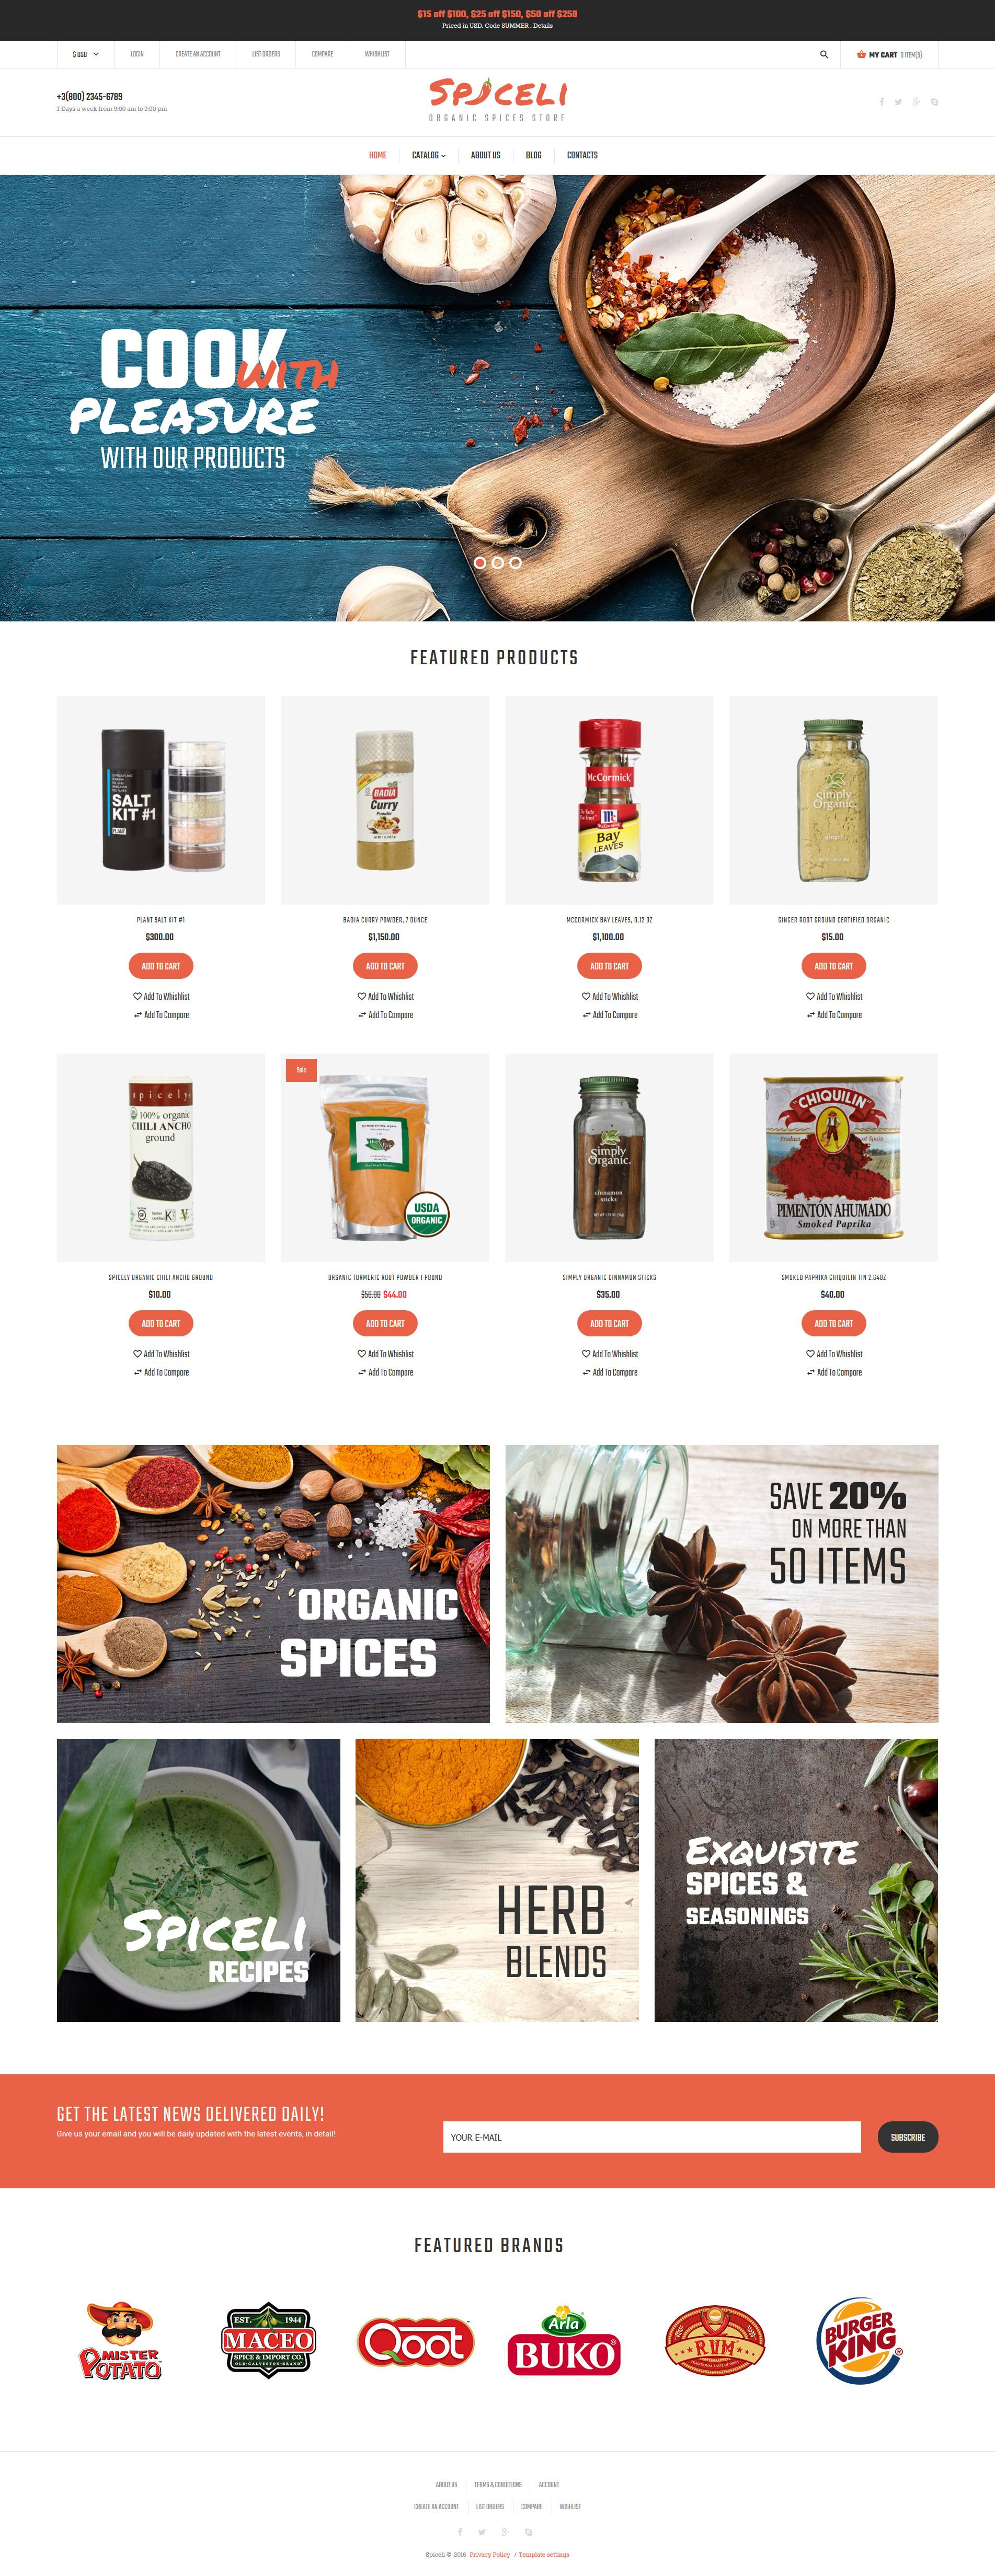 Spice Shop Responsive Virtuemart Template Http Www Templatemonster Com Virtuemart Templates Spice Shop Responsive Virt Shablon Sajta Dizajn Sajta Veb Dizajn